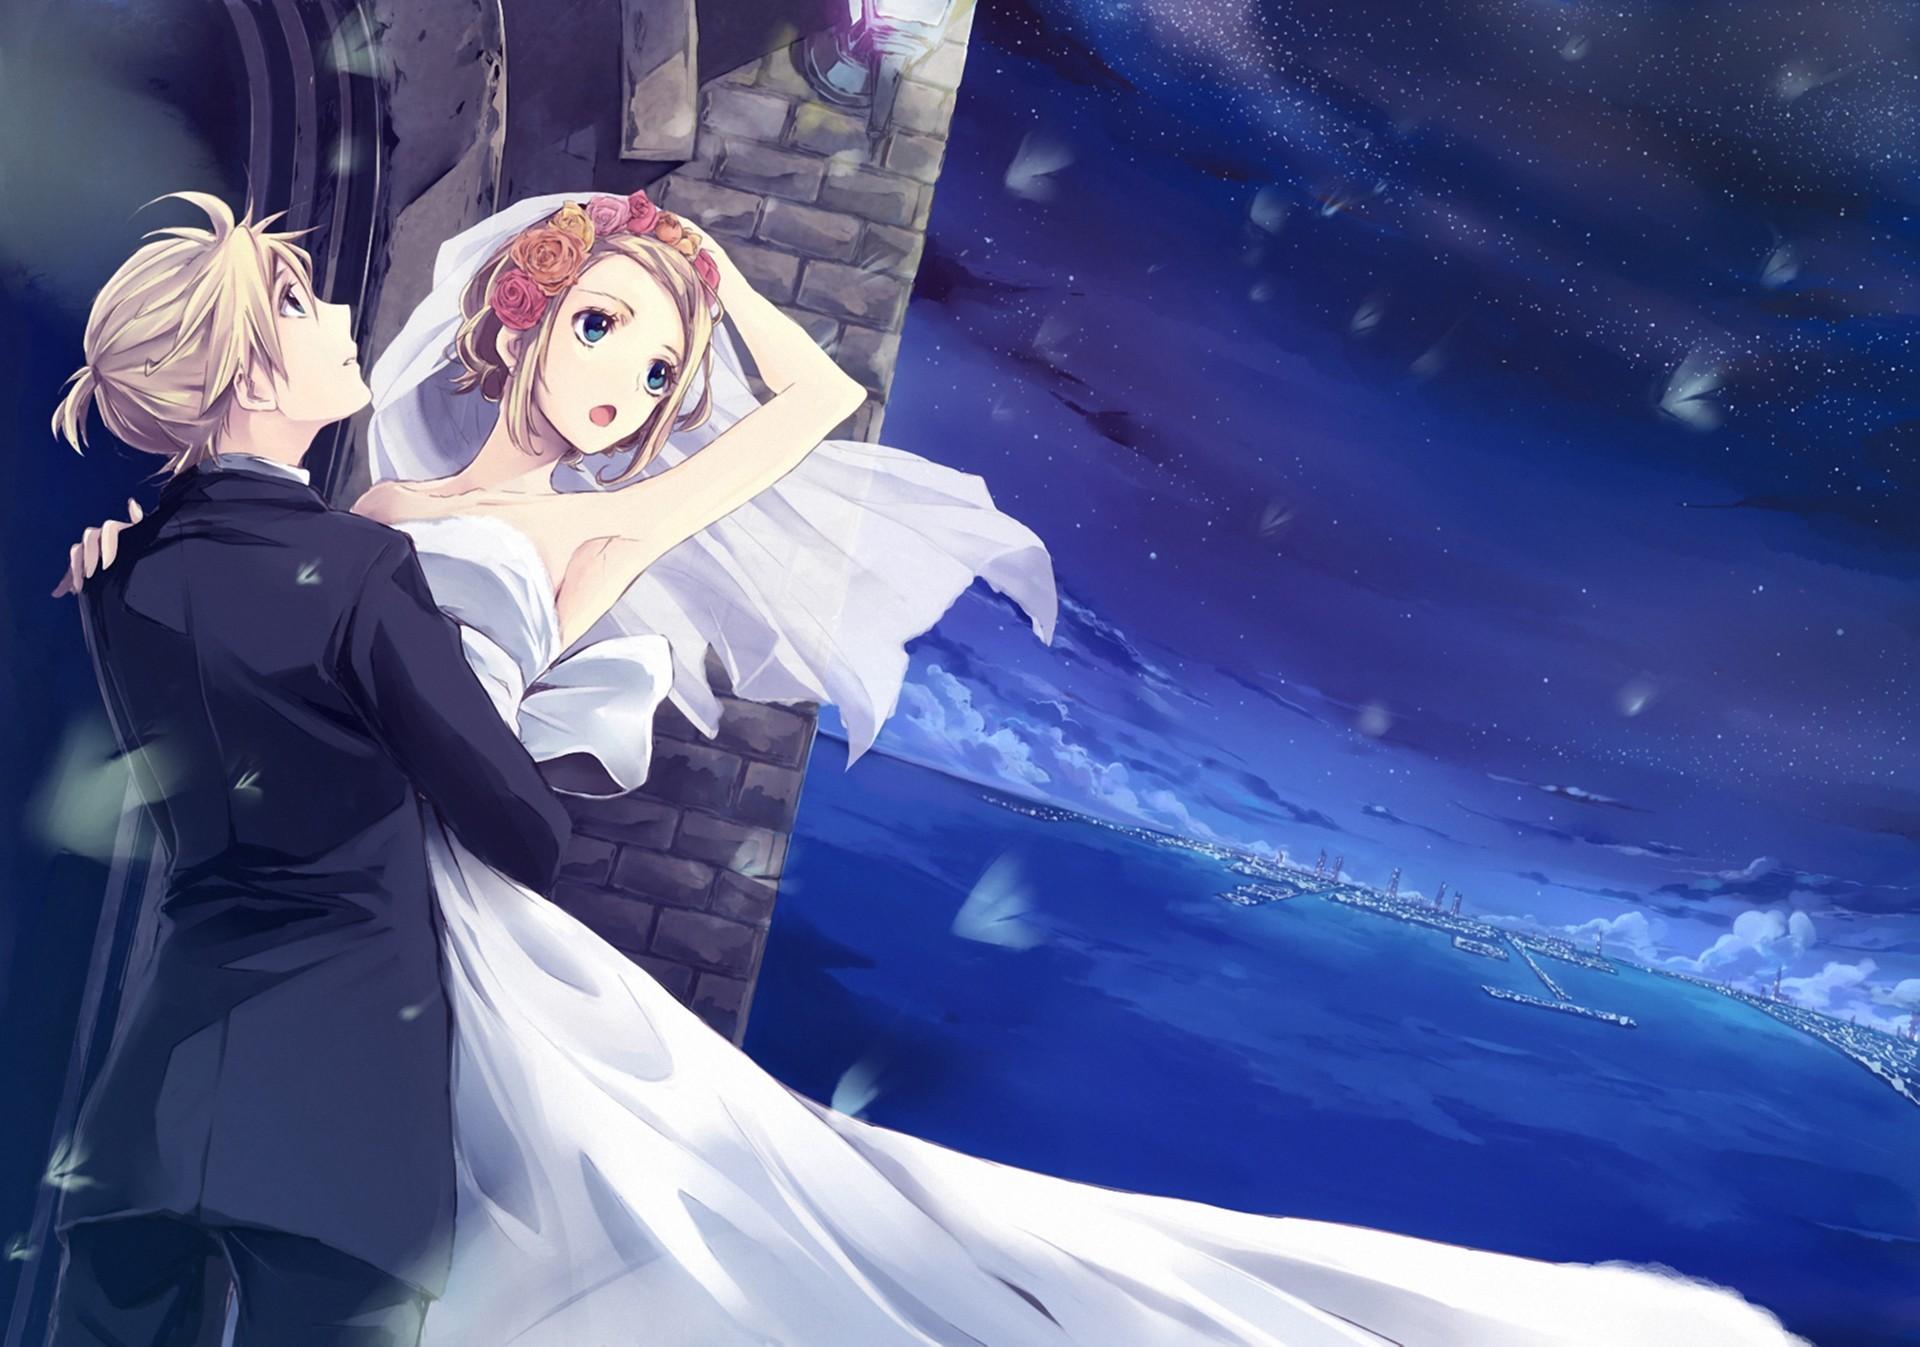 Wallpaper : illustration, anime, blue, Vocaloid, Kagamine Rin